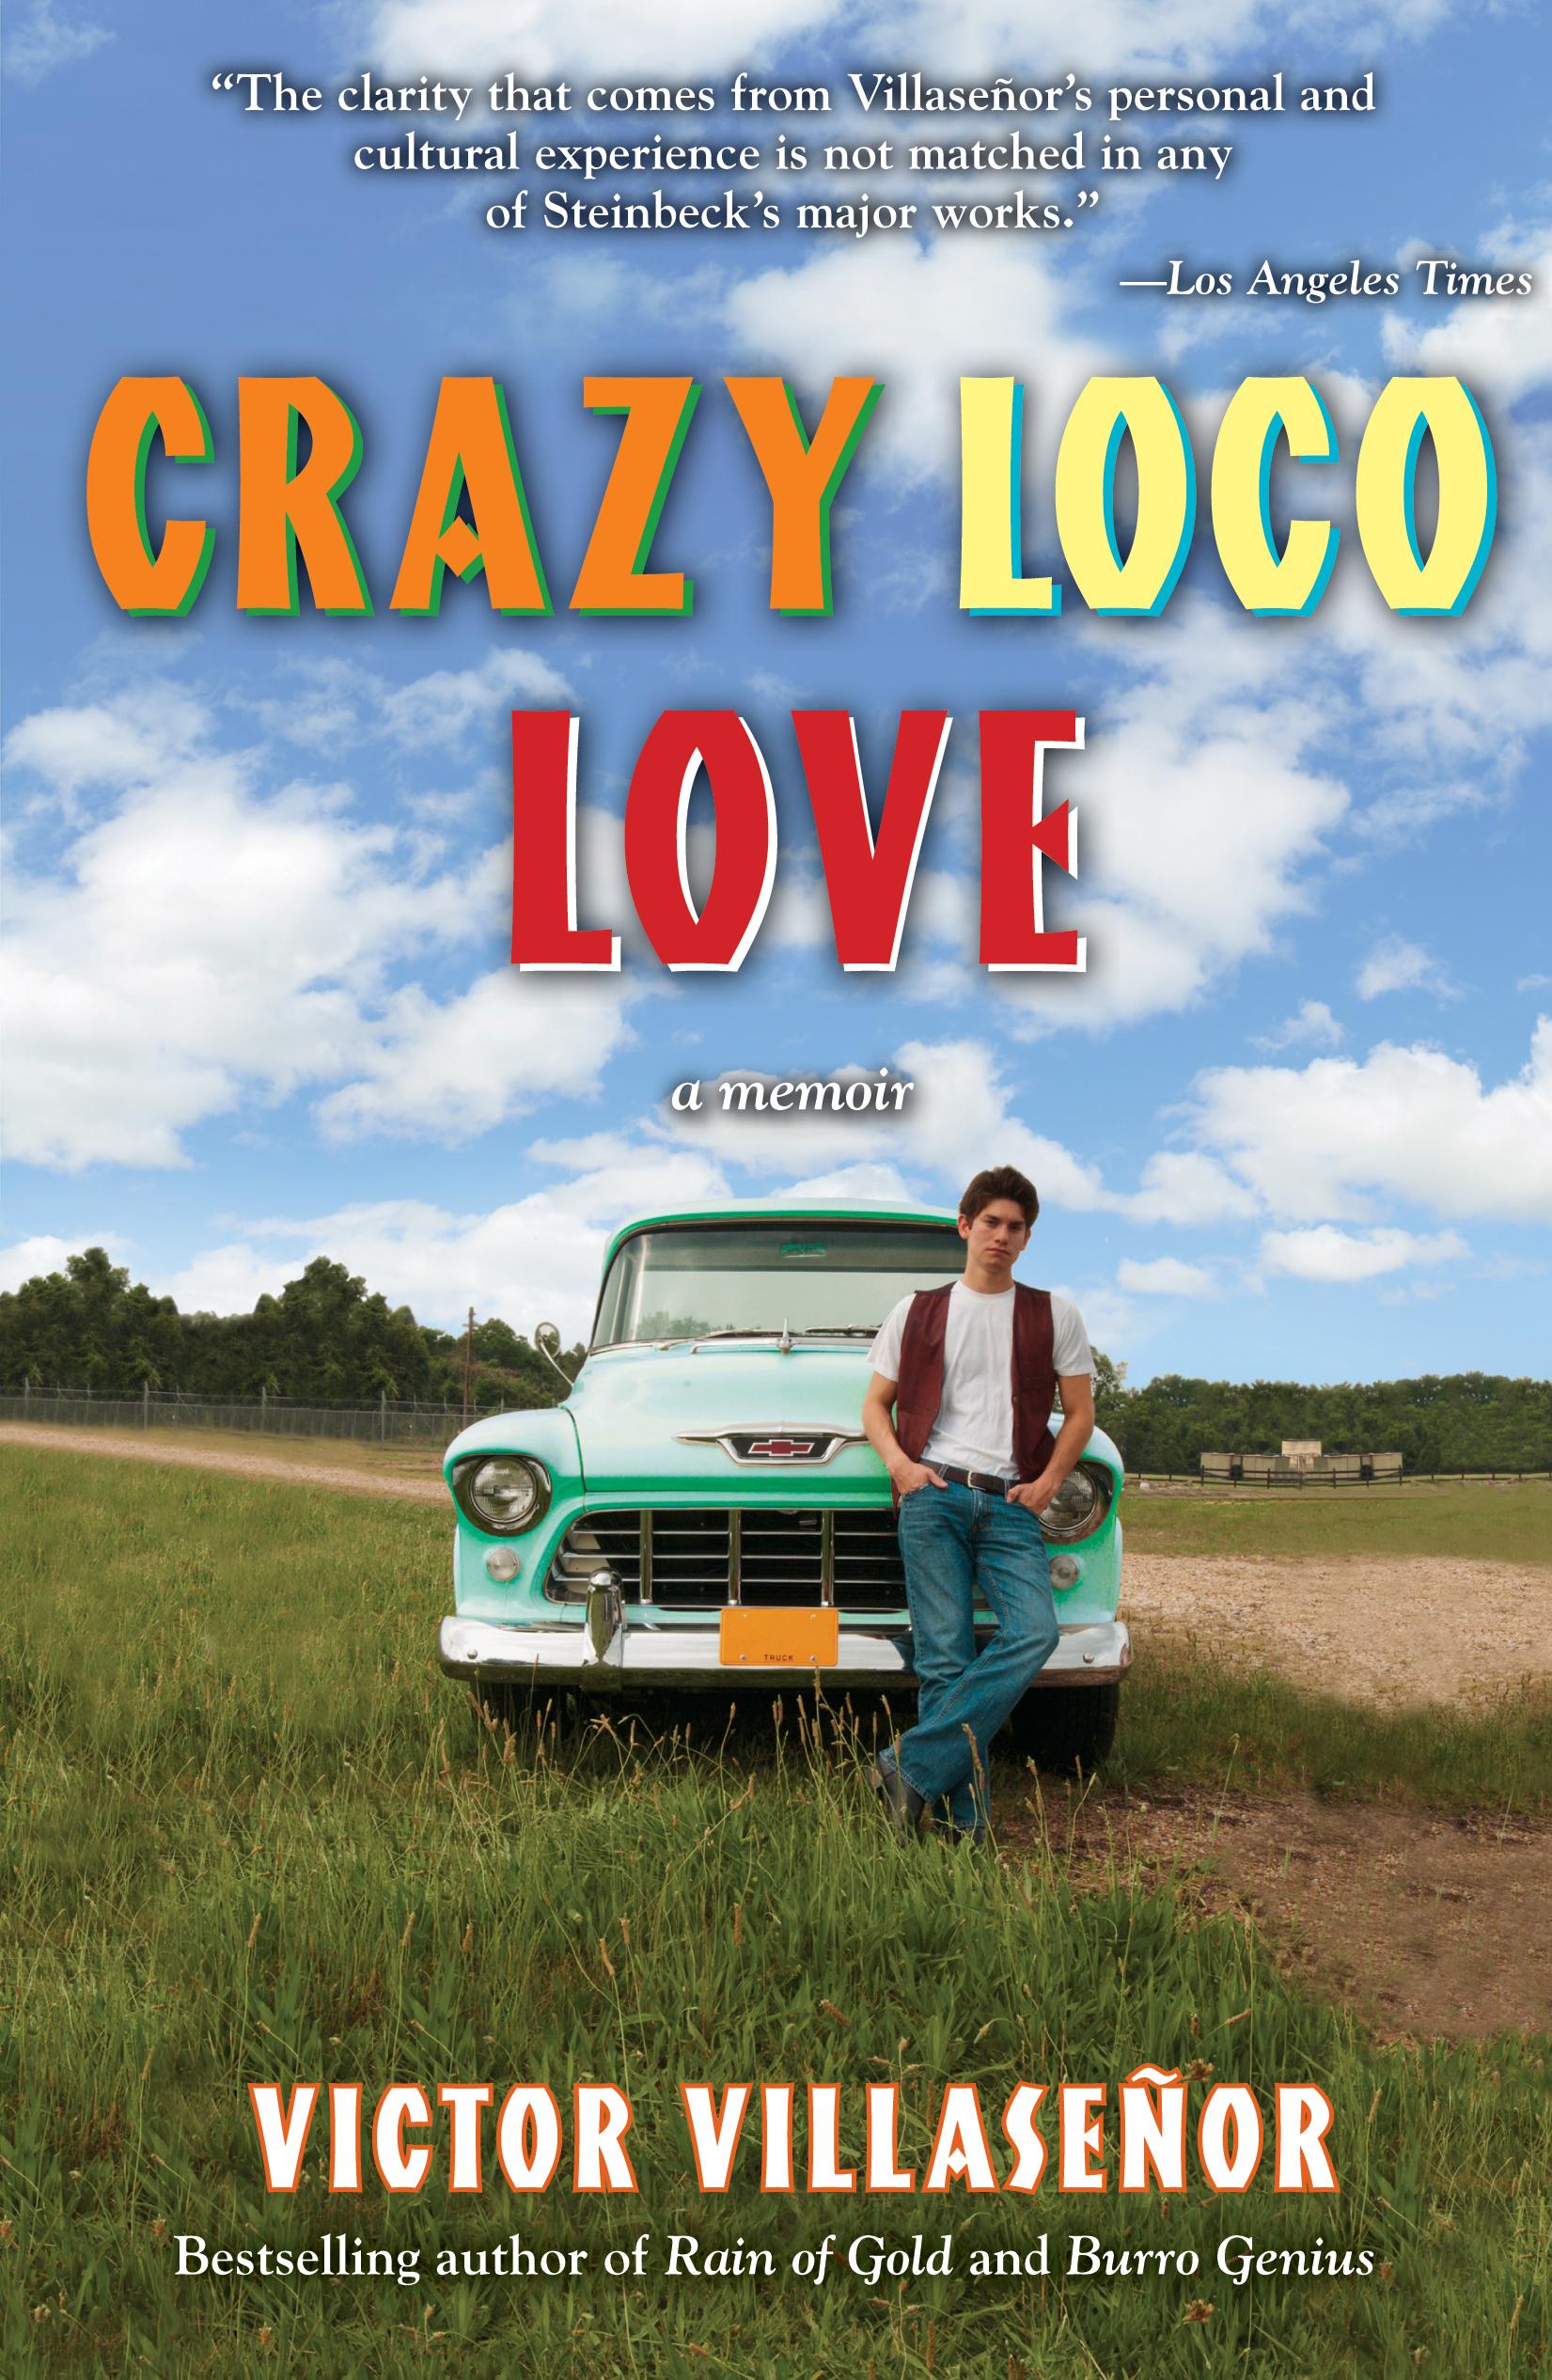 crazy loco love book by victor villasenor official publisher cvr9781582702728 9781582702728 hr